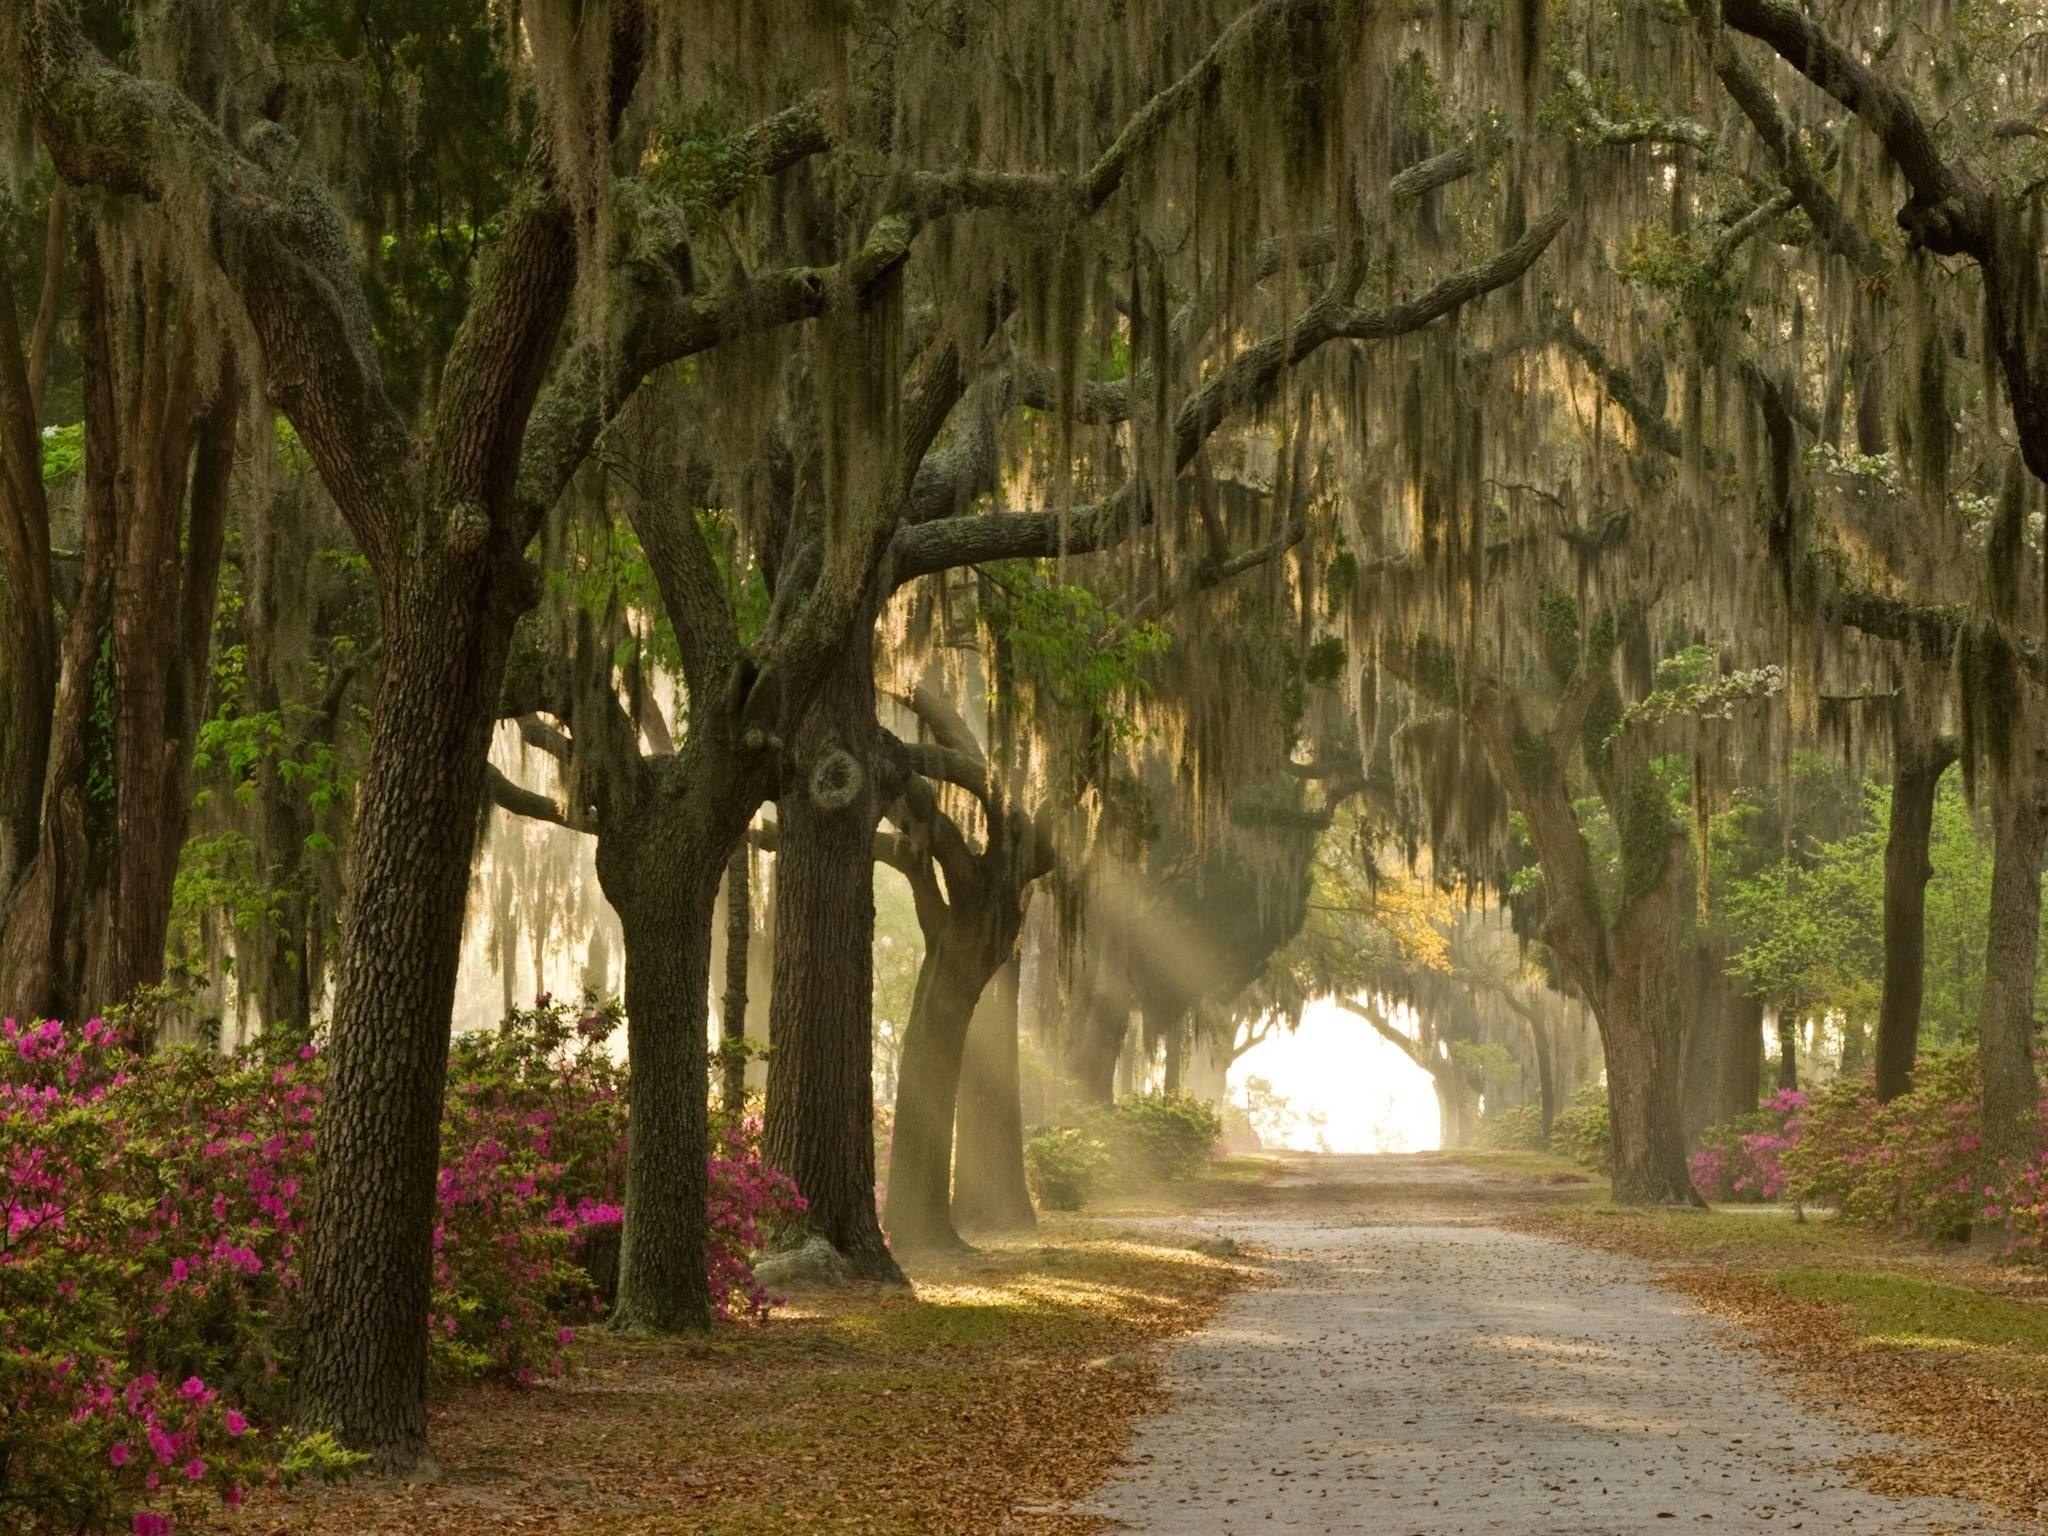 The Best Halloween Cities In America Bonaventure Cemetery - The 7 spookiest cities in america